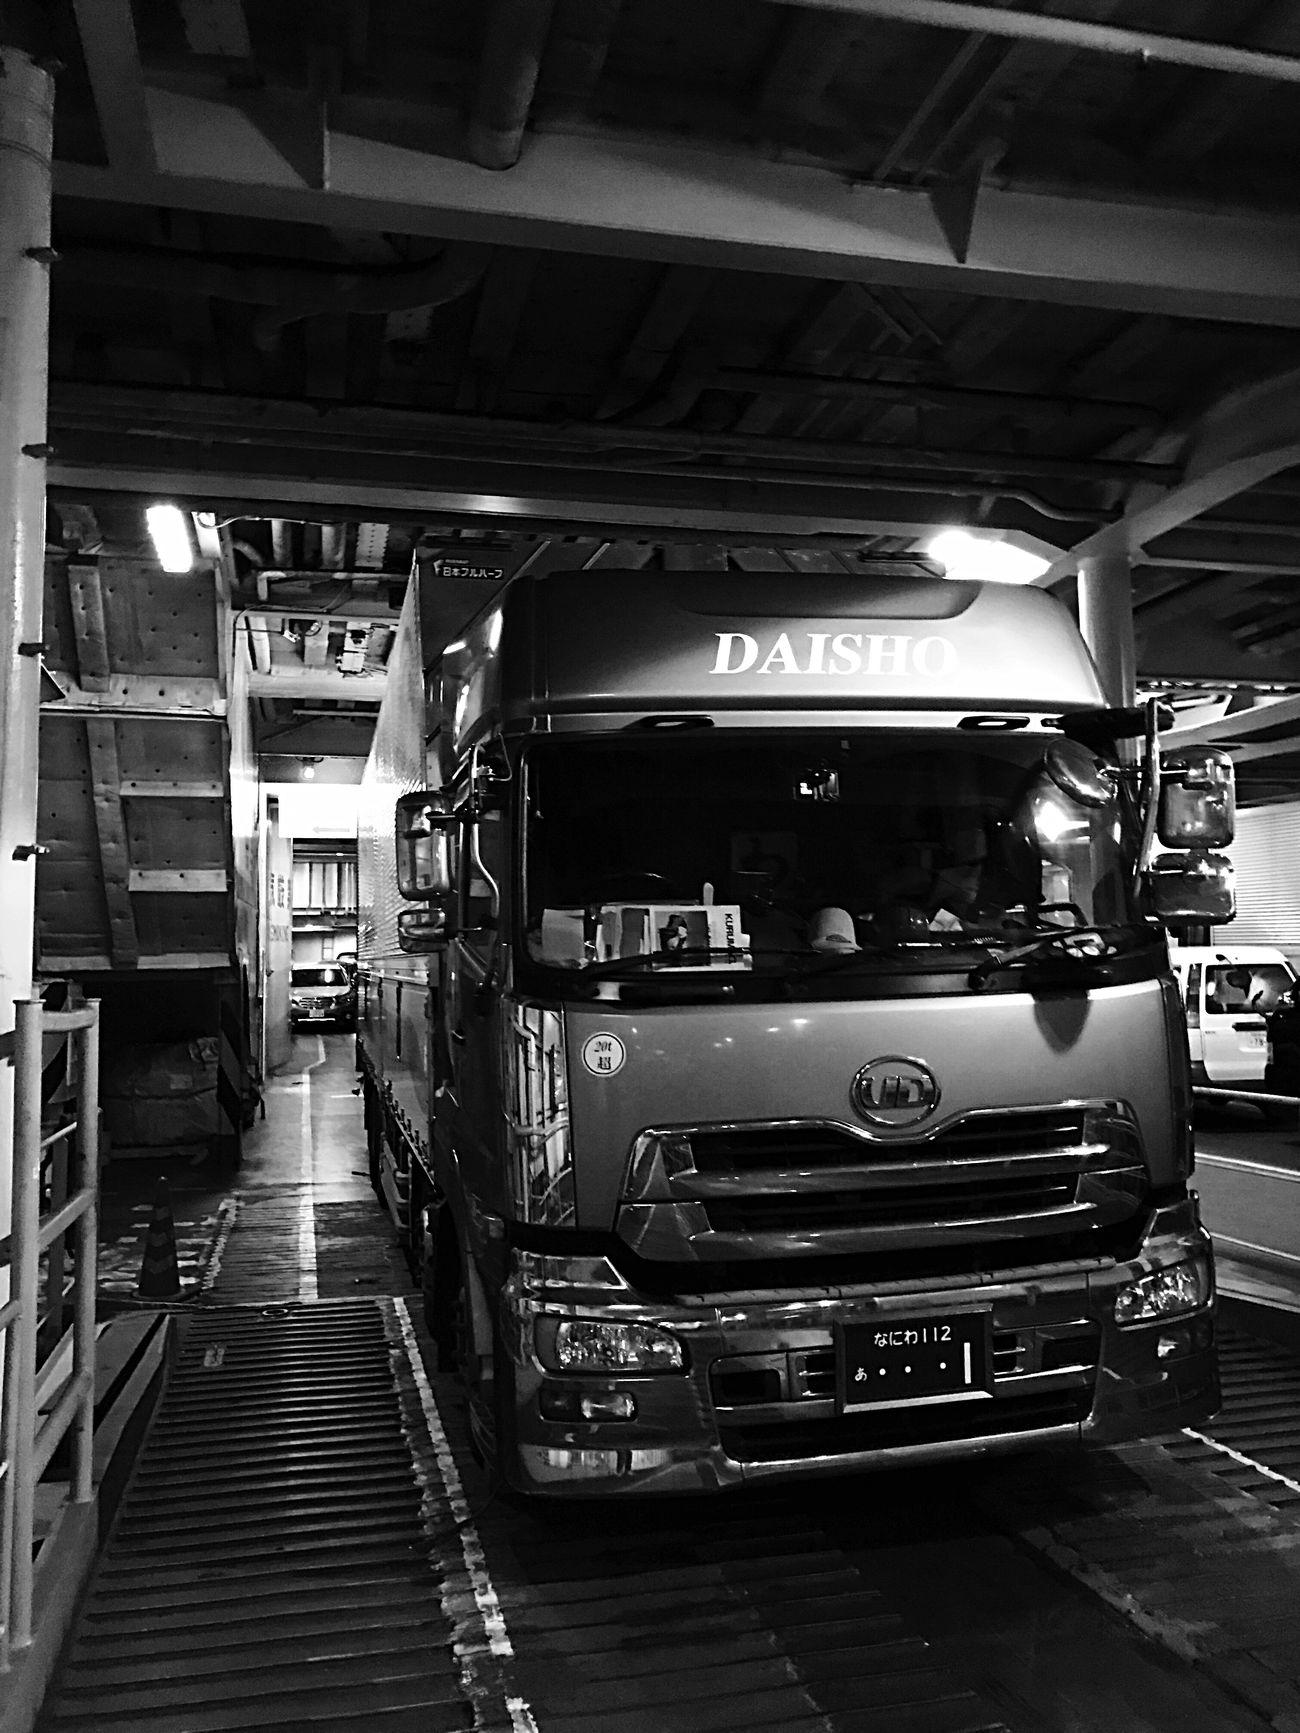 Japan Photography Enjoying Life Japan EyeEm Gallery EyeEmBestPics Self Portrait EyeEm Japan Truck Black And White Trucking Nissan Trucks EyeEm Best Shots EyeEm Light And Shadow EyeEm Best Edits